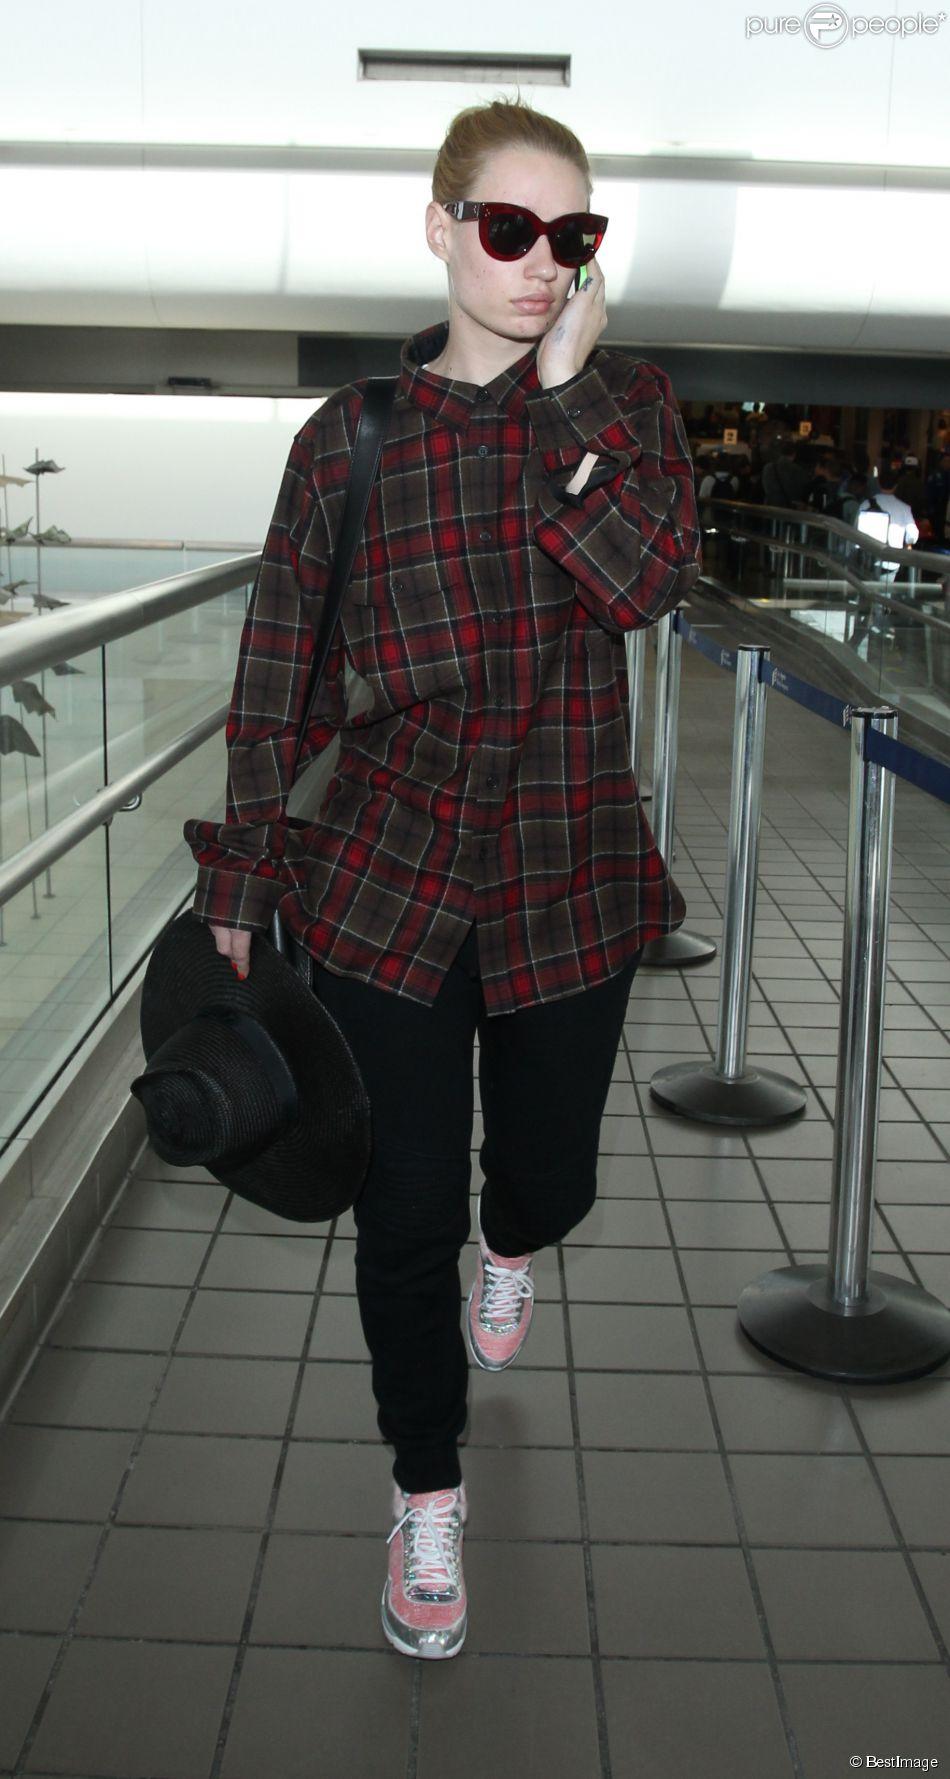 Iggy Azalea arrive à l'aéroport LAX de Los Angeles. Le 20 octobre 2014.